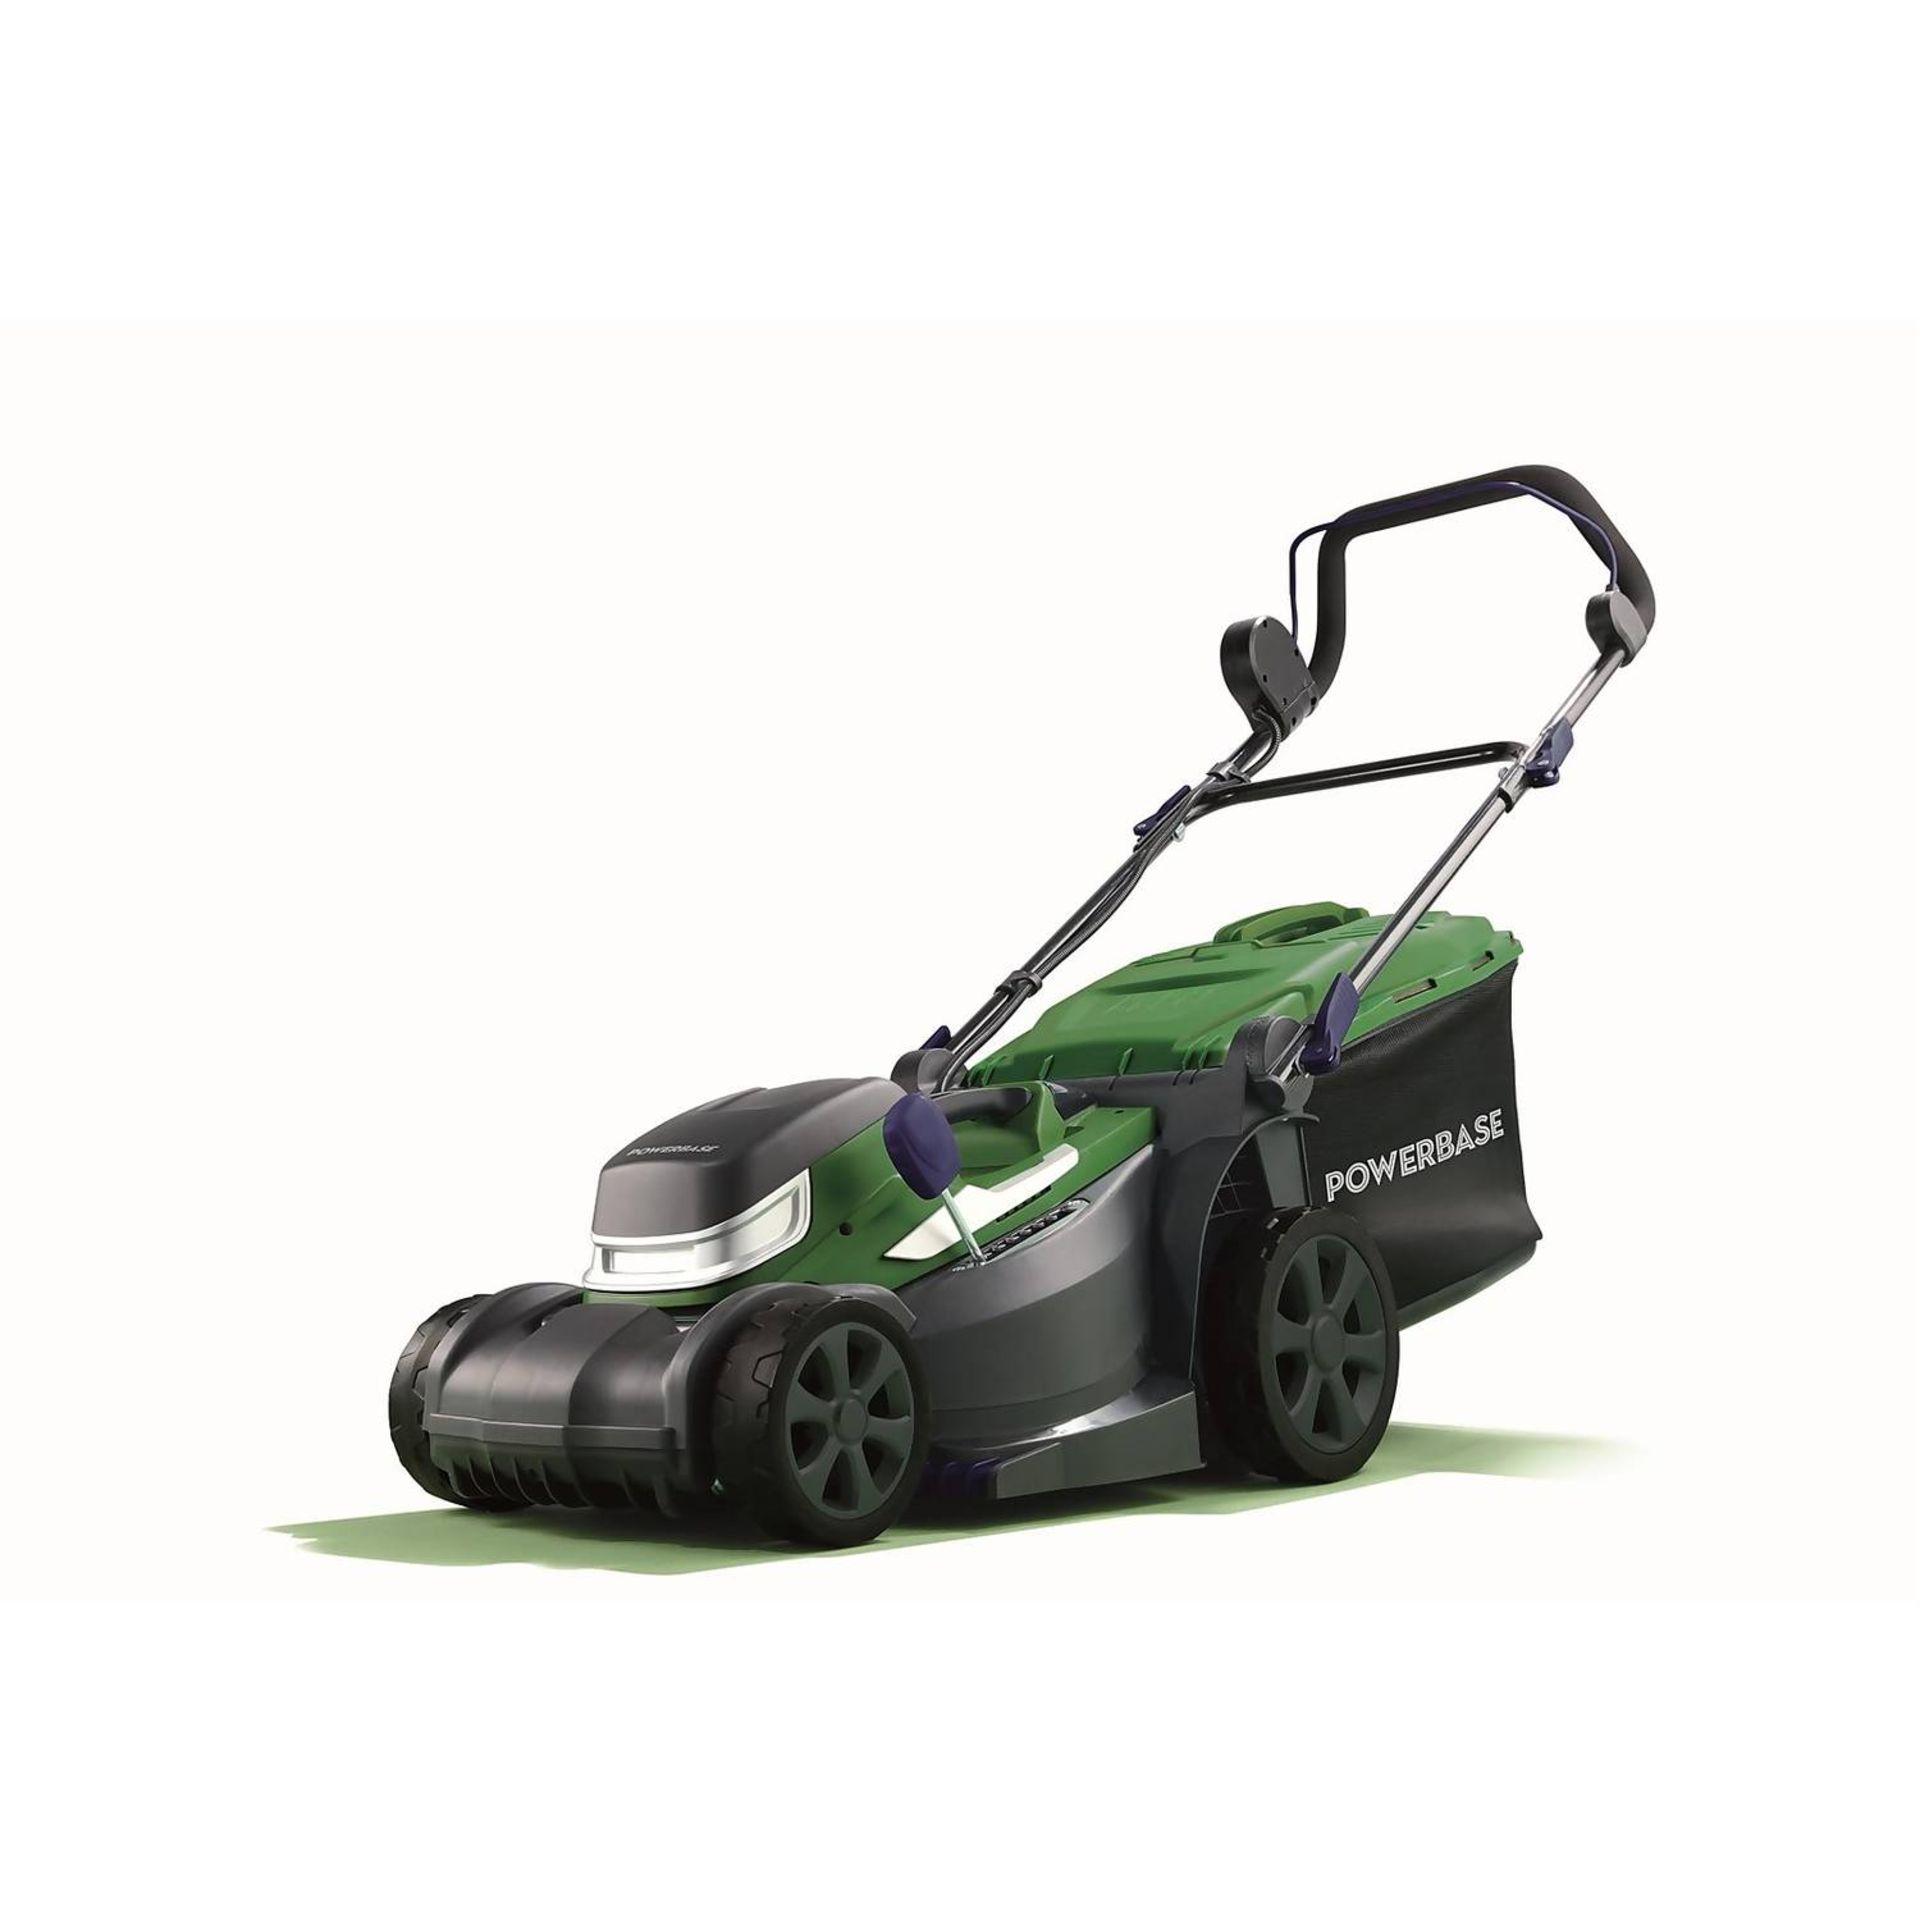 (P7) 1x Powerbase 34cm 40V Cordless Lawn Mower RRP £169. New, Sealed Item.